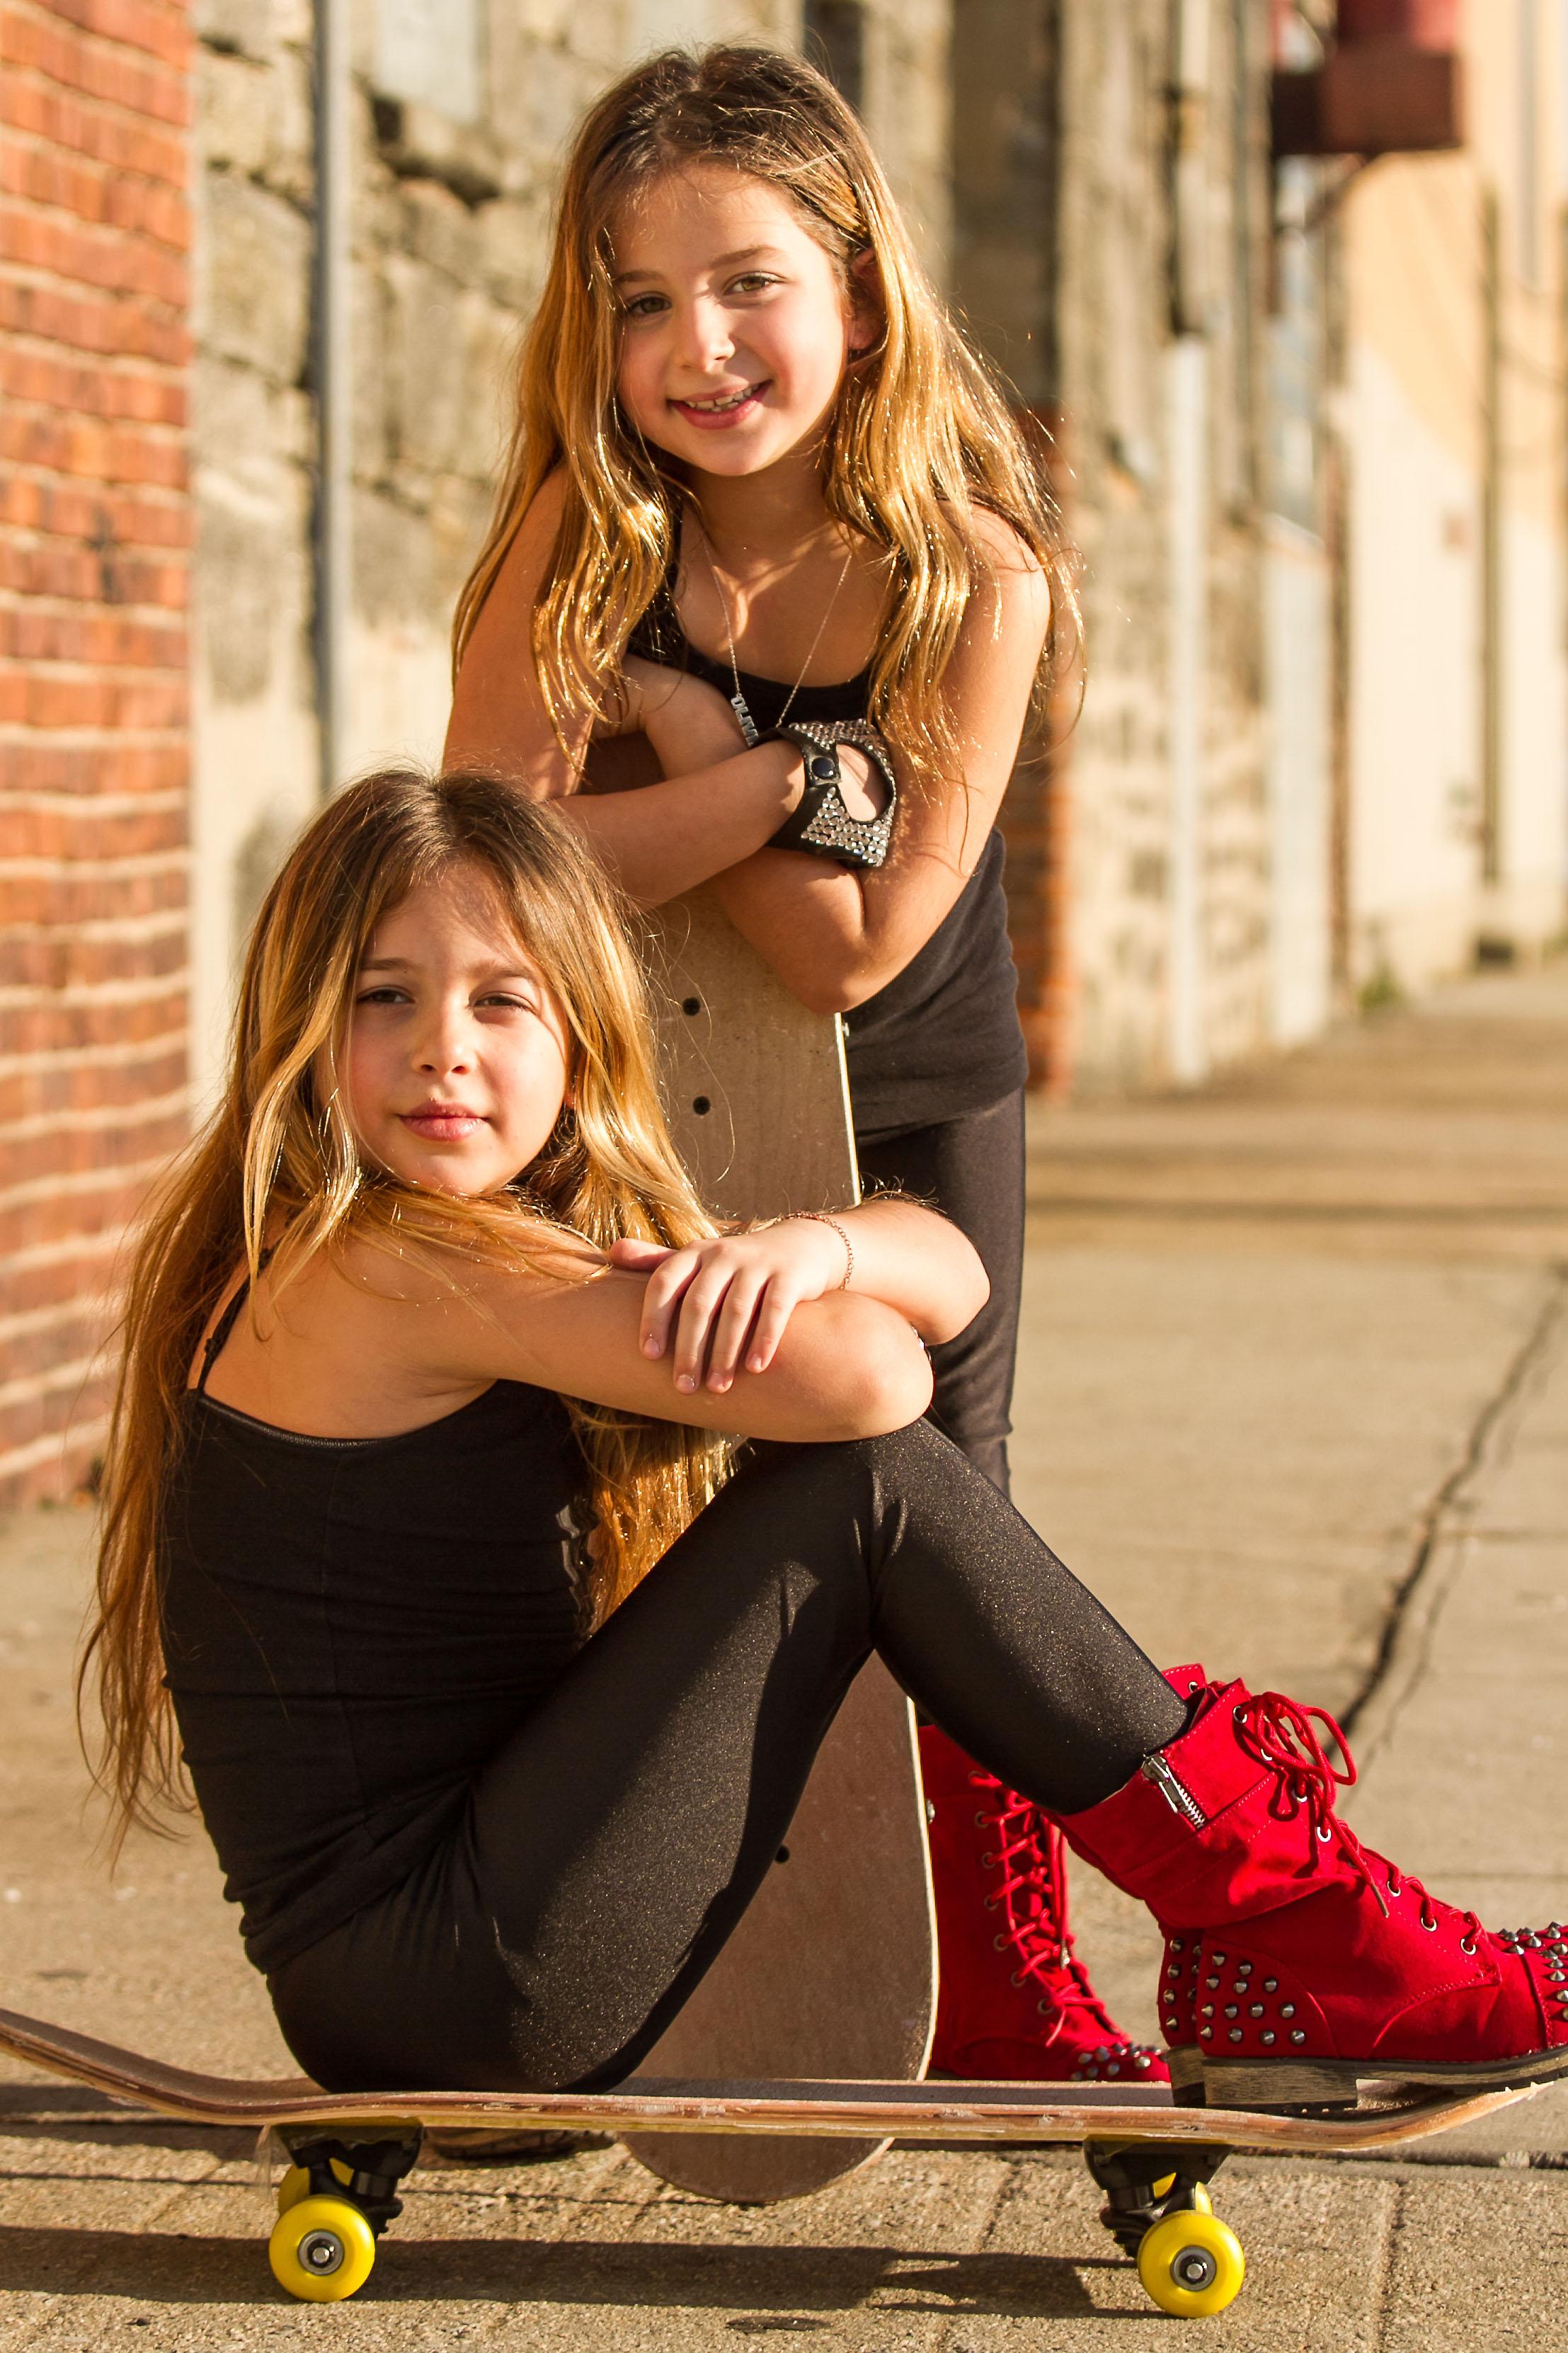 skateboarding sisters.jpg